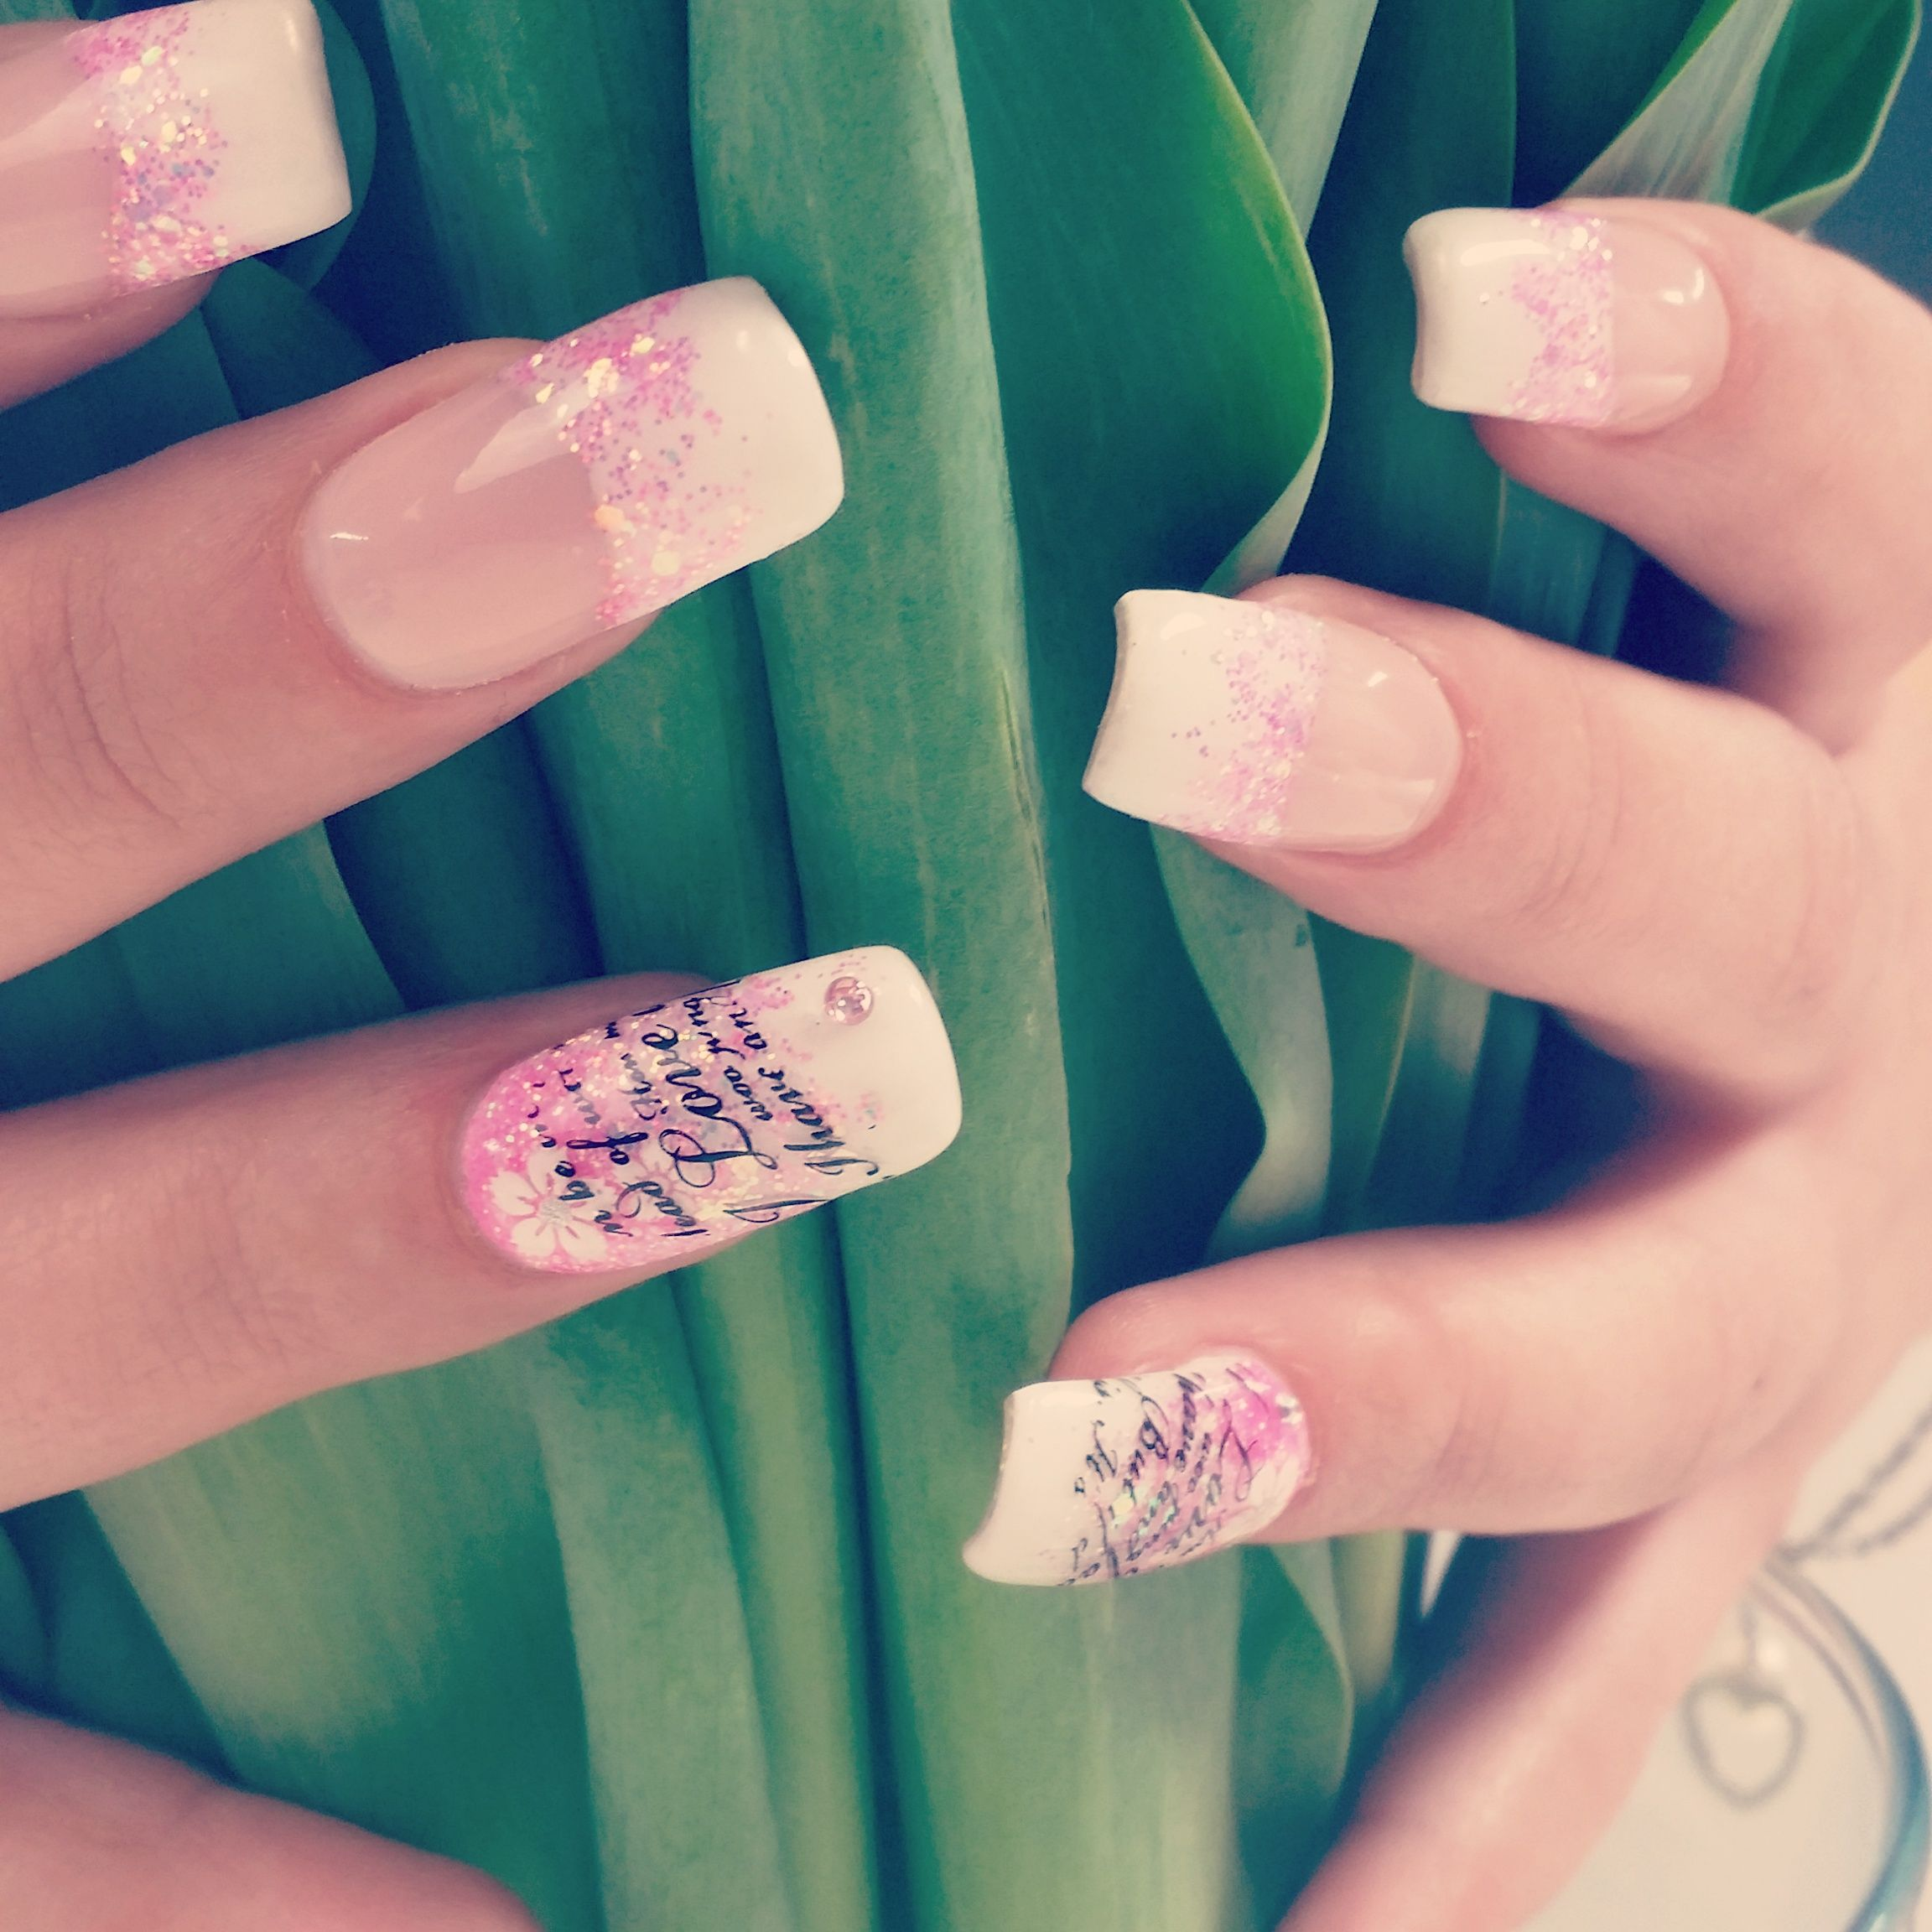 Messenägel #jolifin #beauty #beautyinternational #naildesign #nails ...